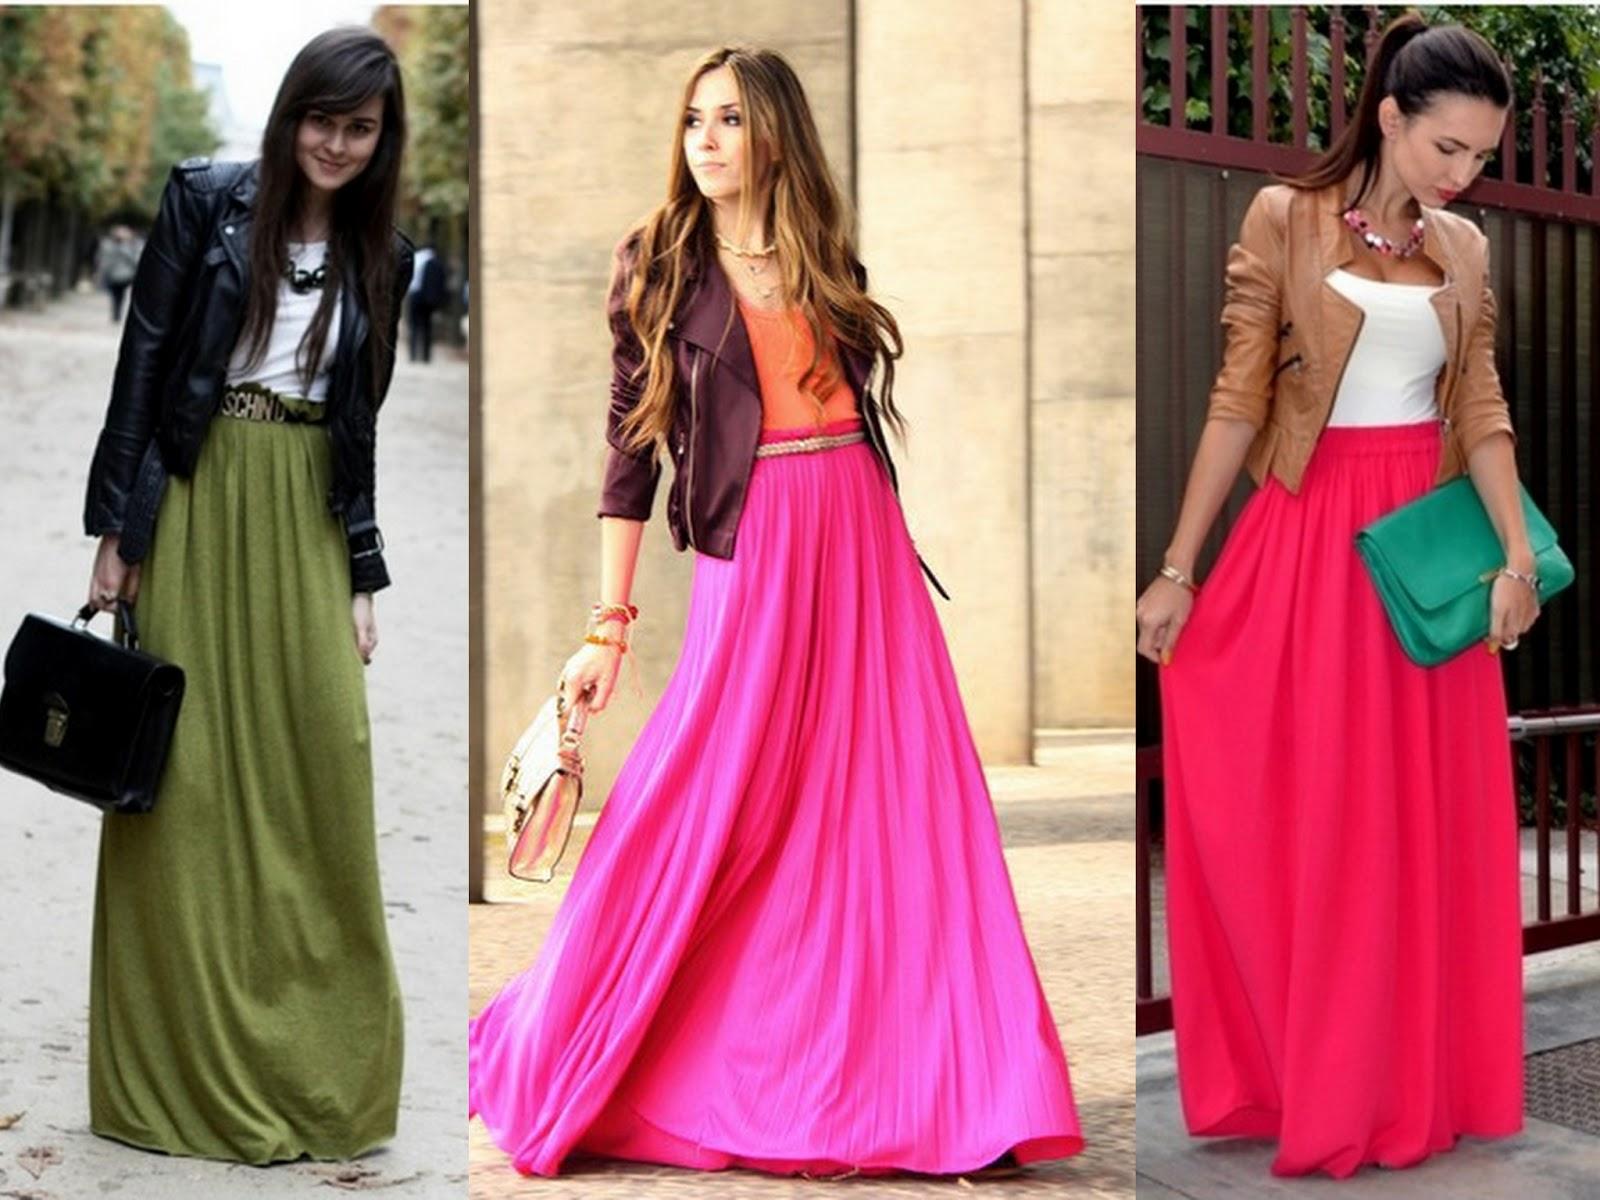 Dlugie modne sukienki (5)